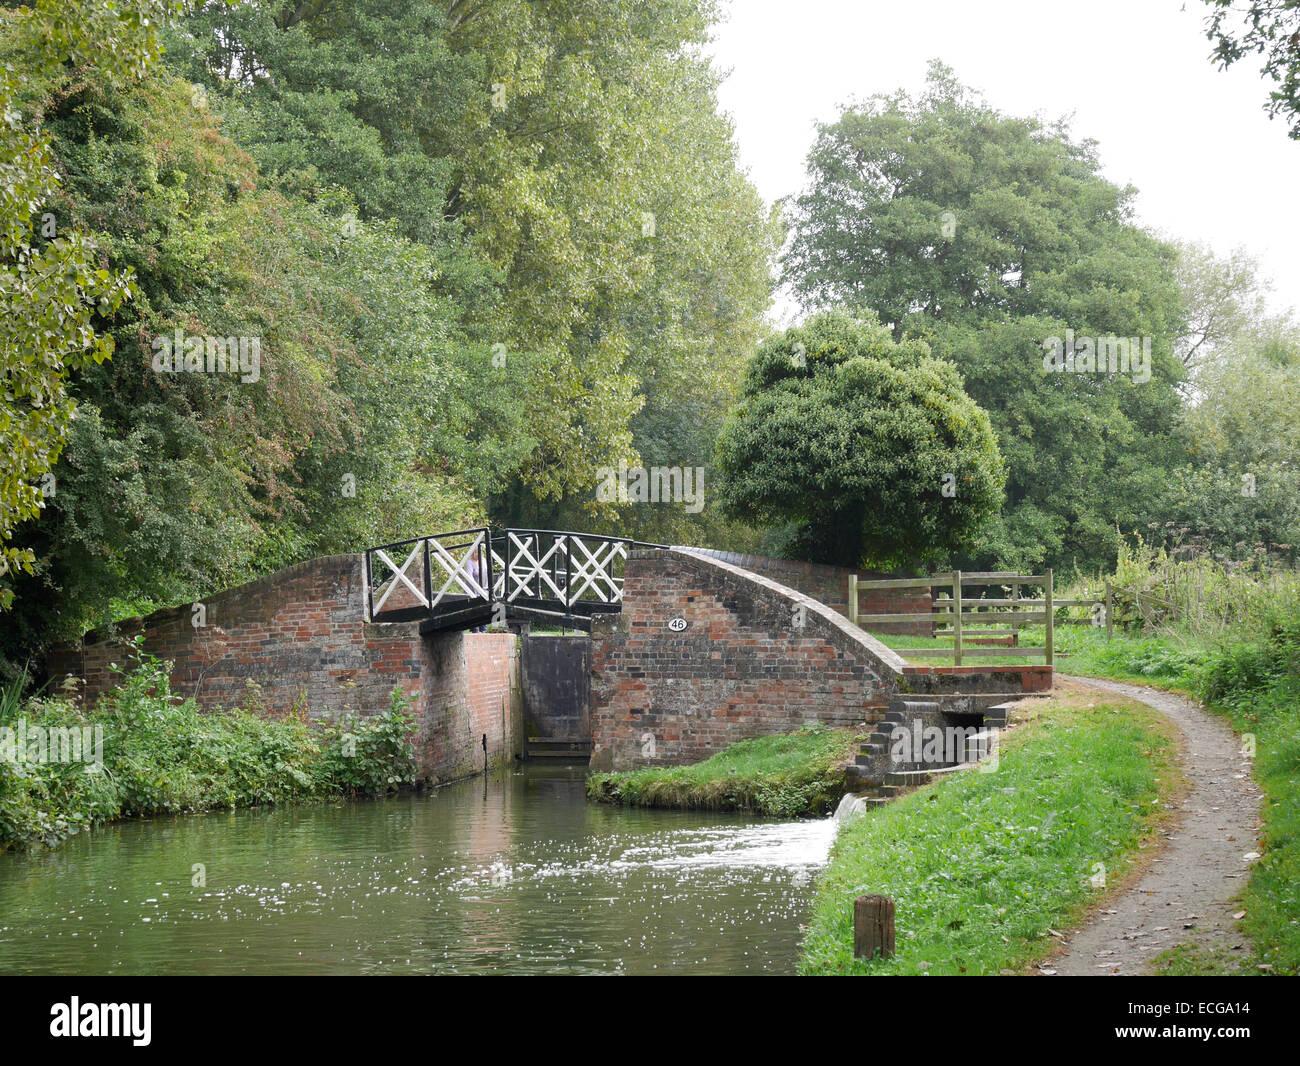 split cantilever bridge 46 Stratford canal Warwickshire England - Stock Image